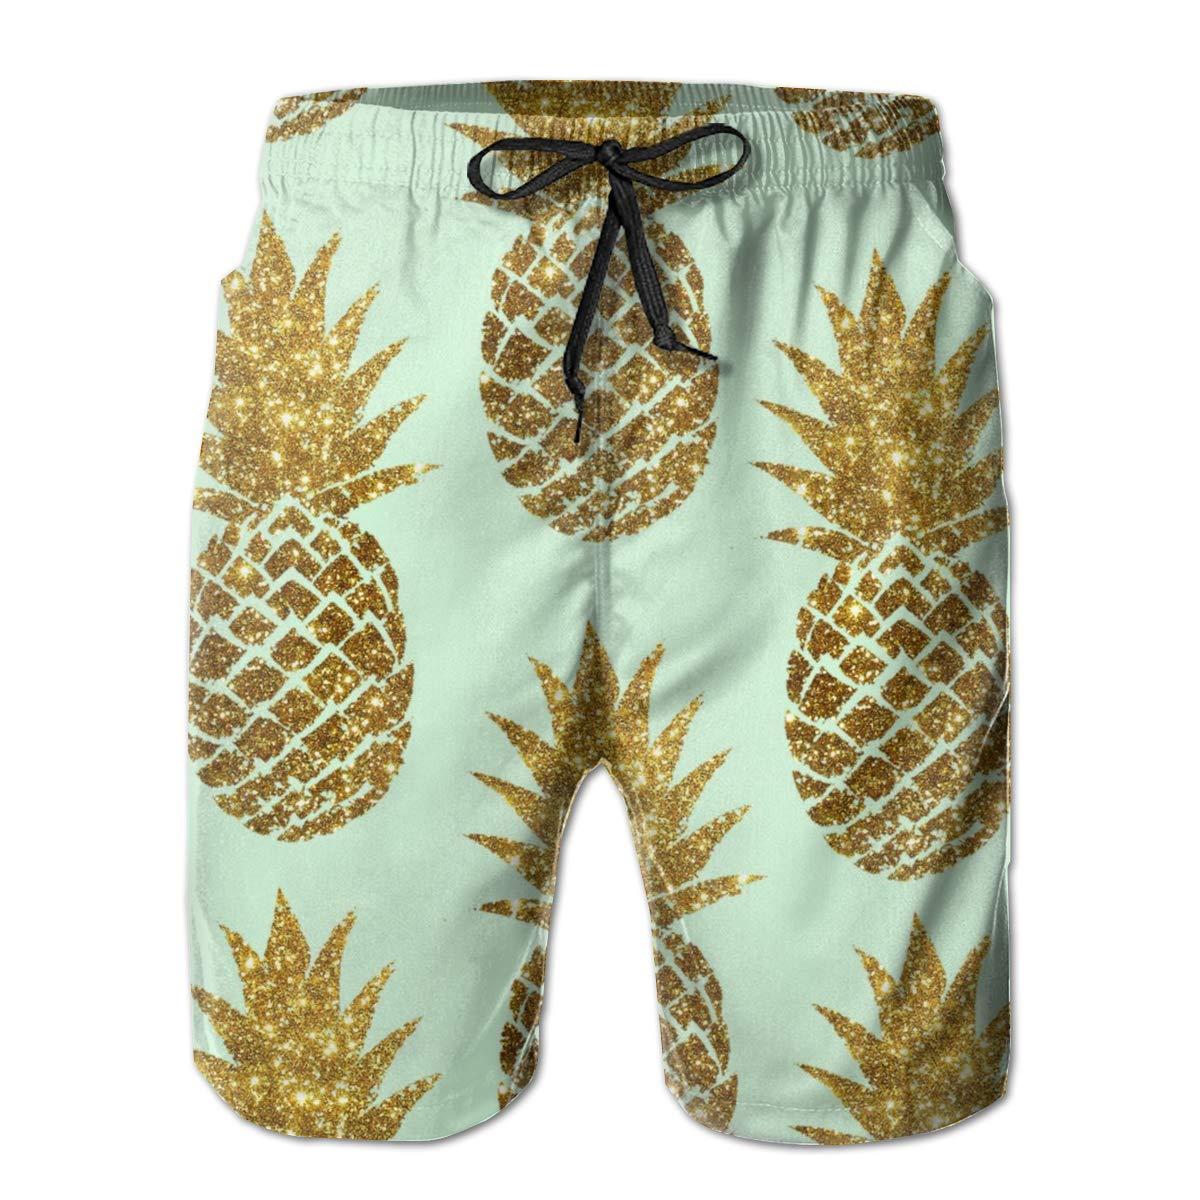 b3e4258400 Amazon.com: Classic-Fit Swim Trunks Big &Tall Half Pants for Boys Mens,  Loose Bathing Suits: Clothing